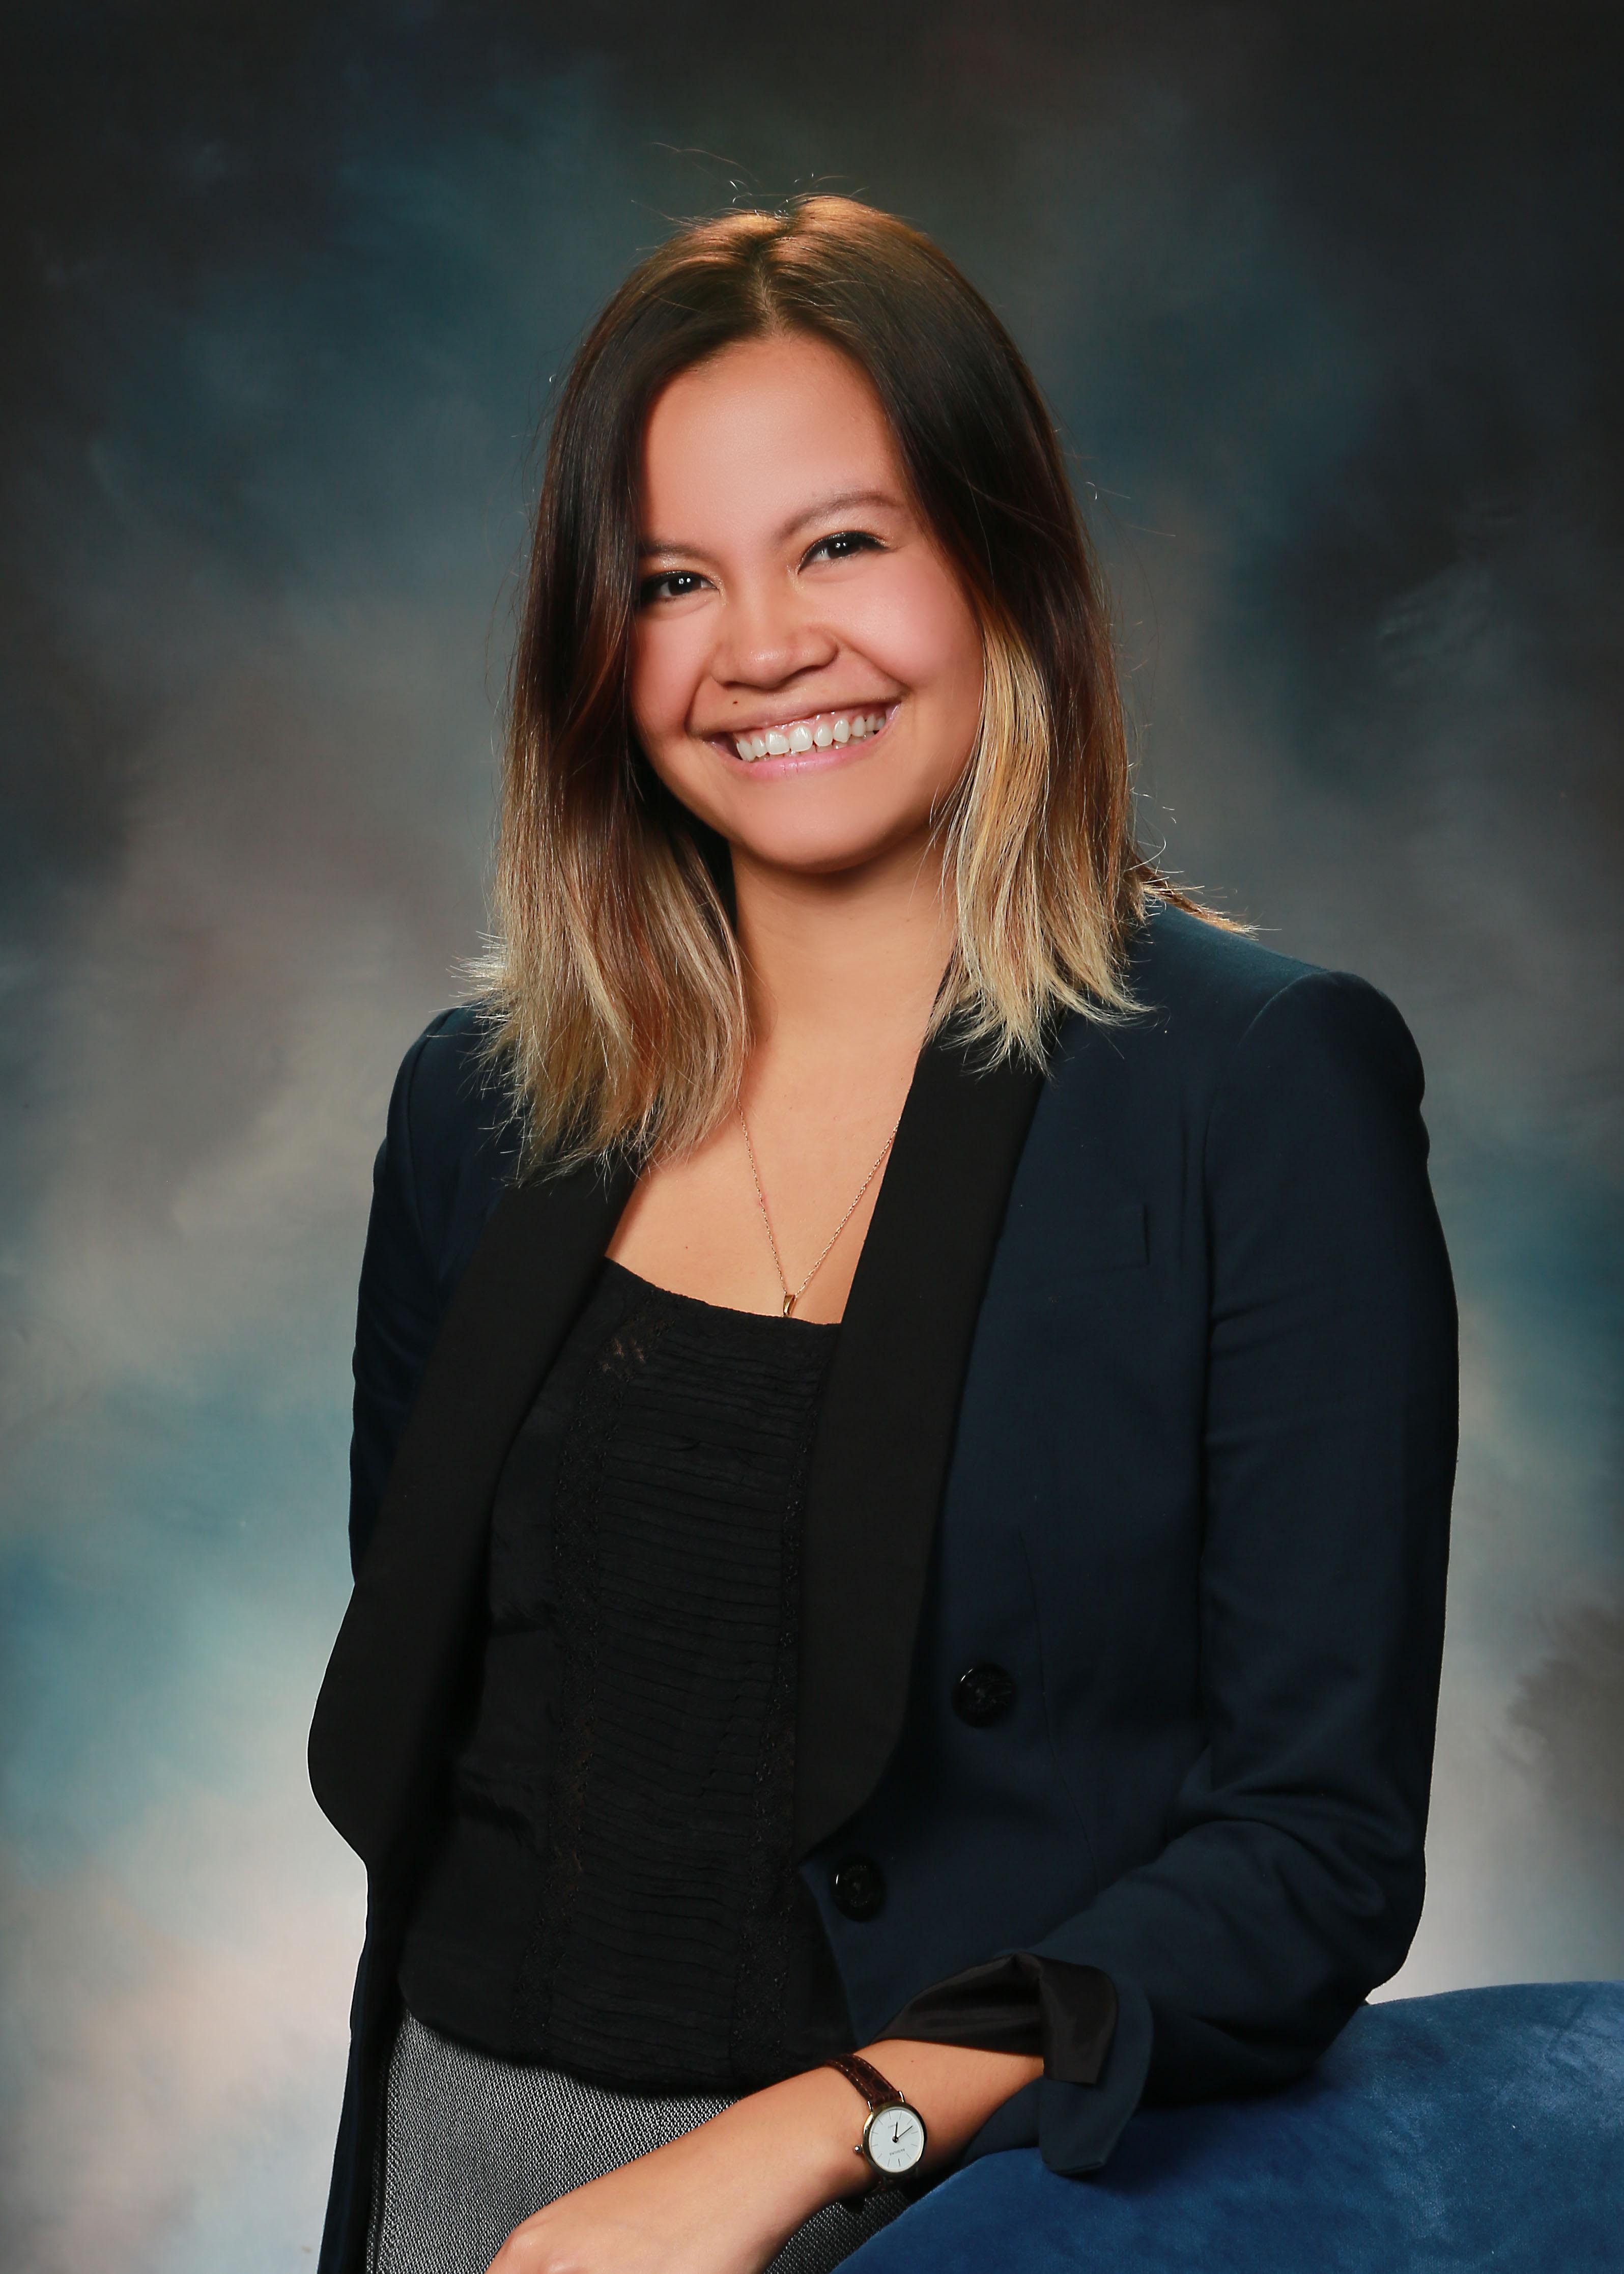 Katreena Casallo